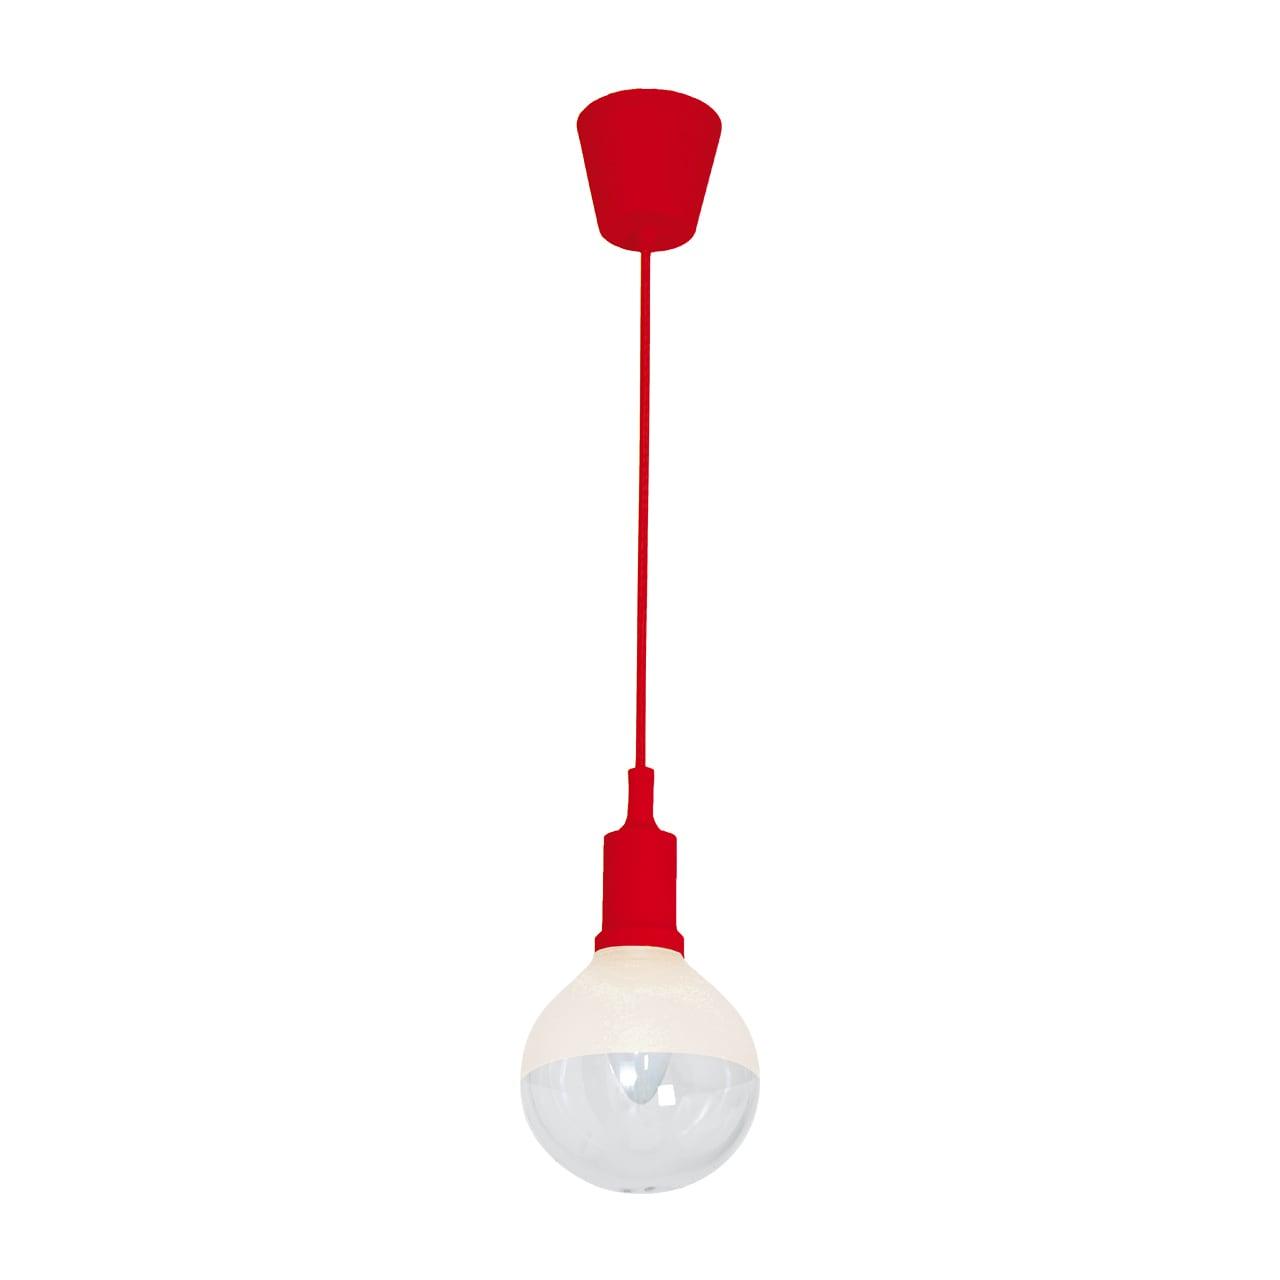 Lampa suspendată Milagro BUBBLE RED 462 Roșu 5W